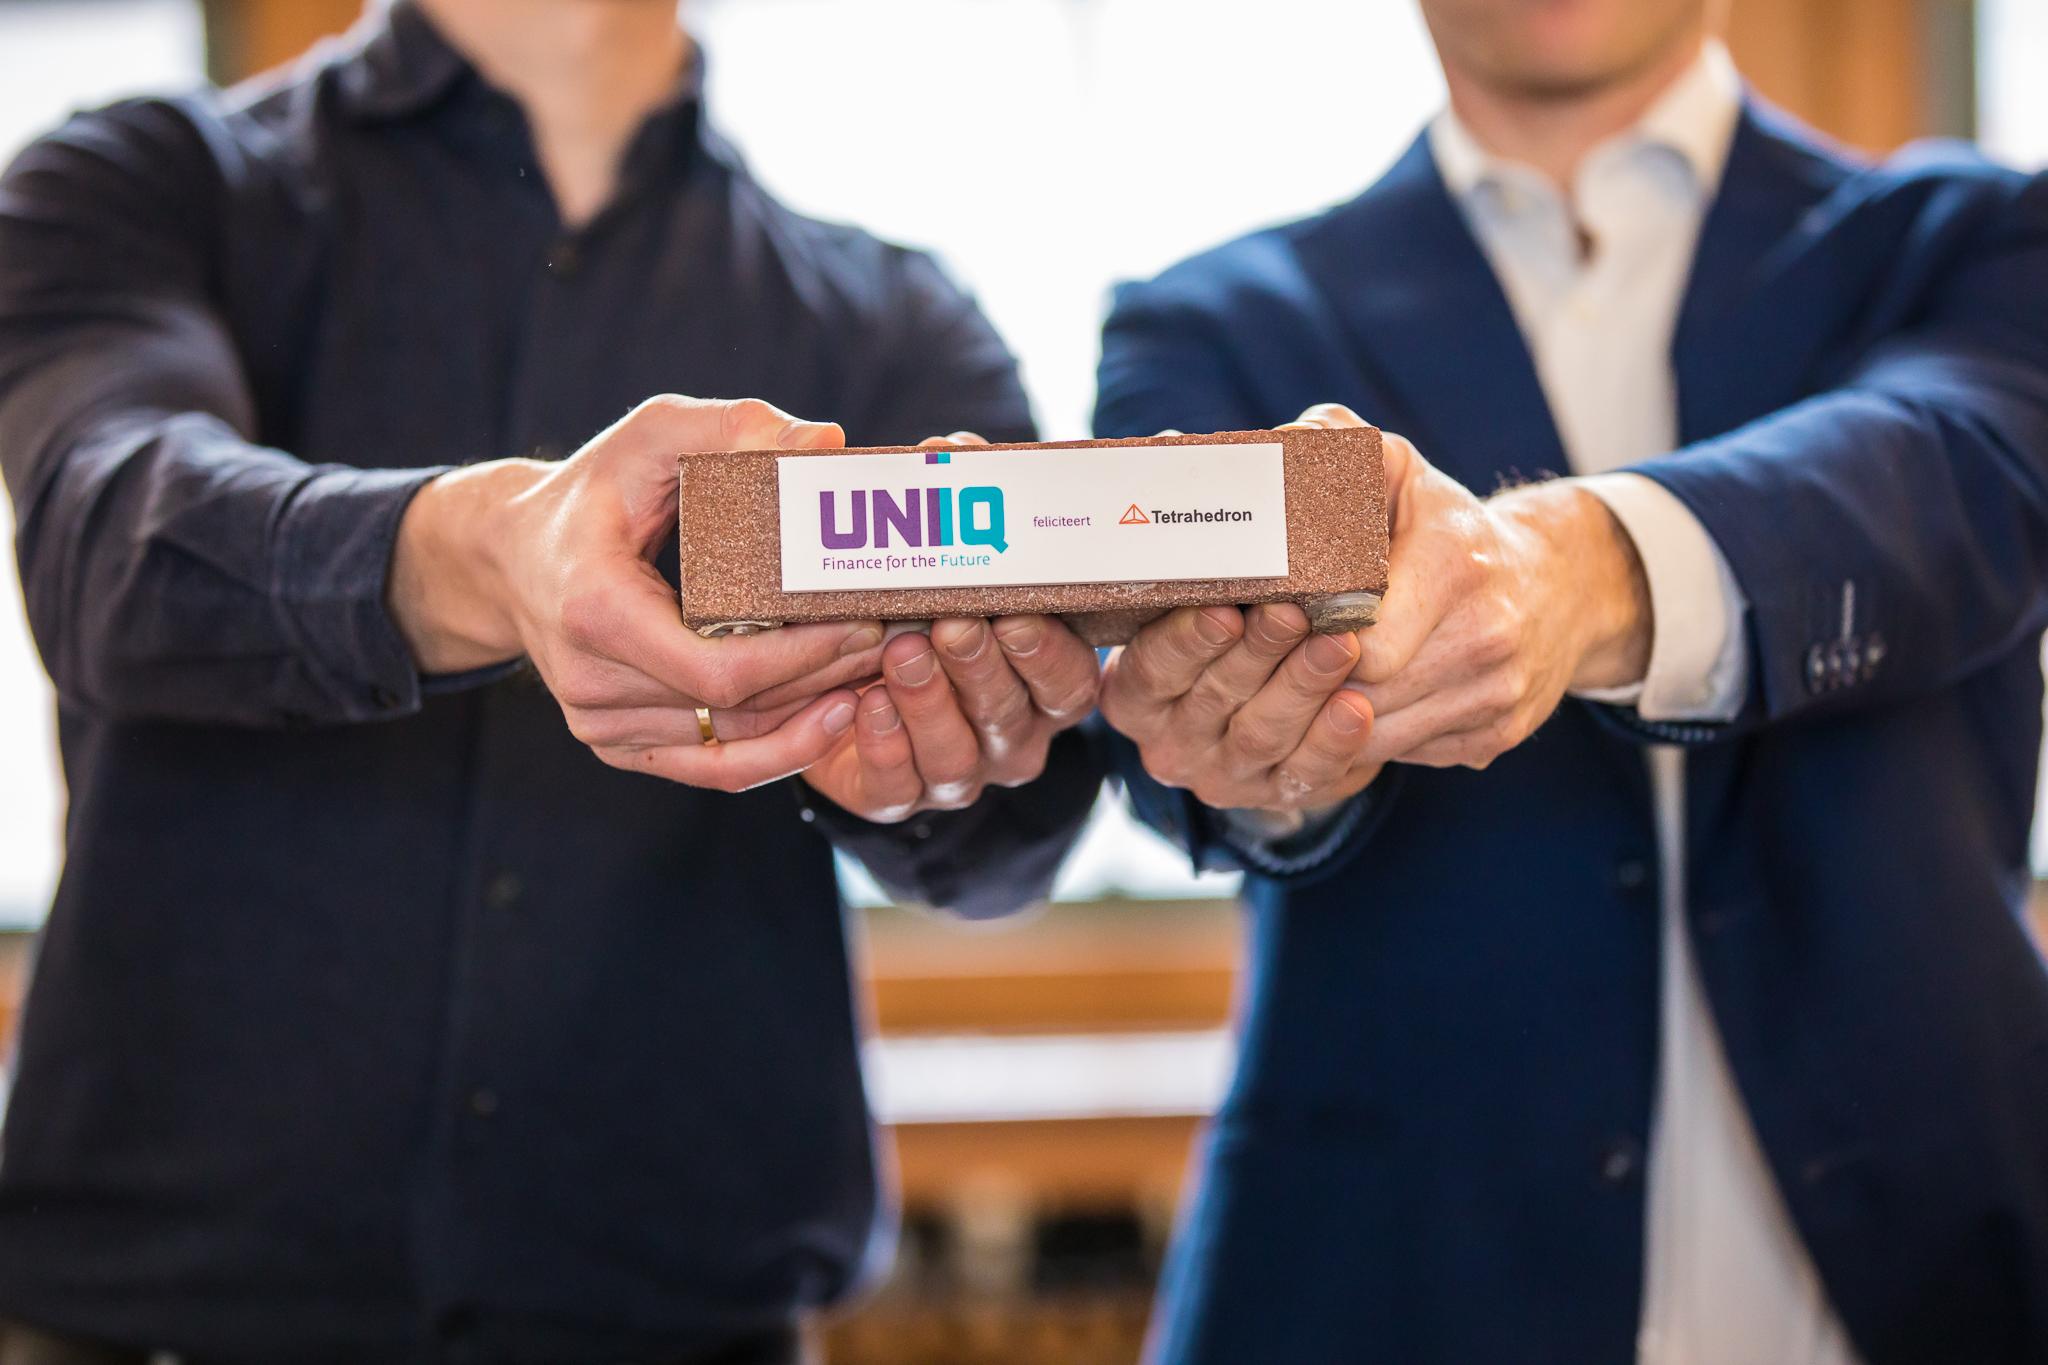 Tetrahedron ontvangt UNIIQ-investering